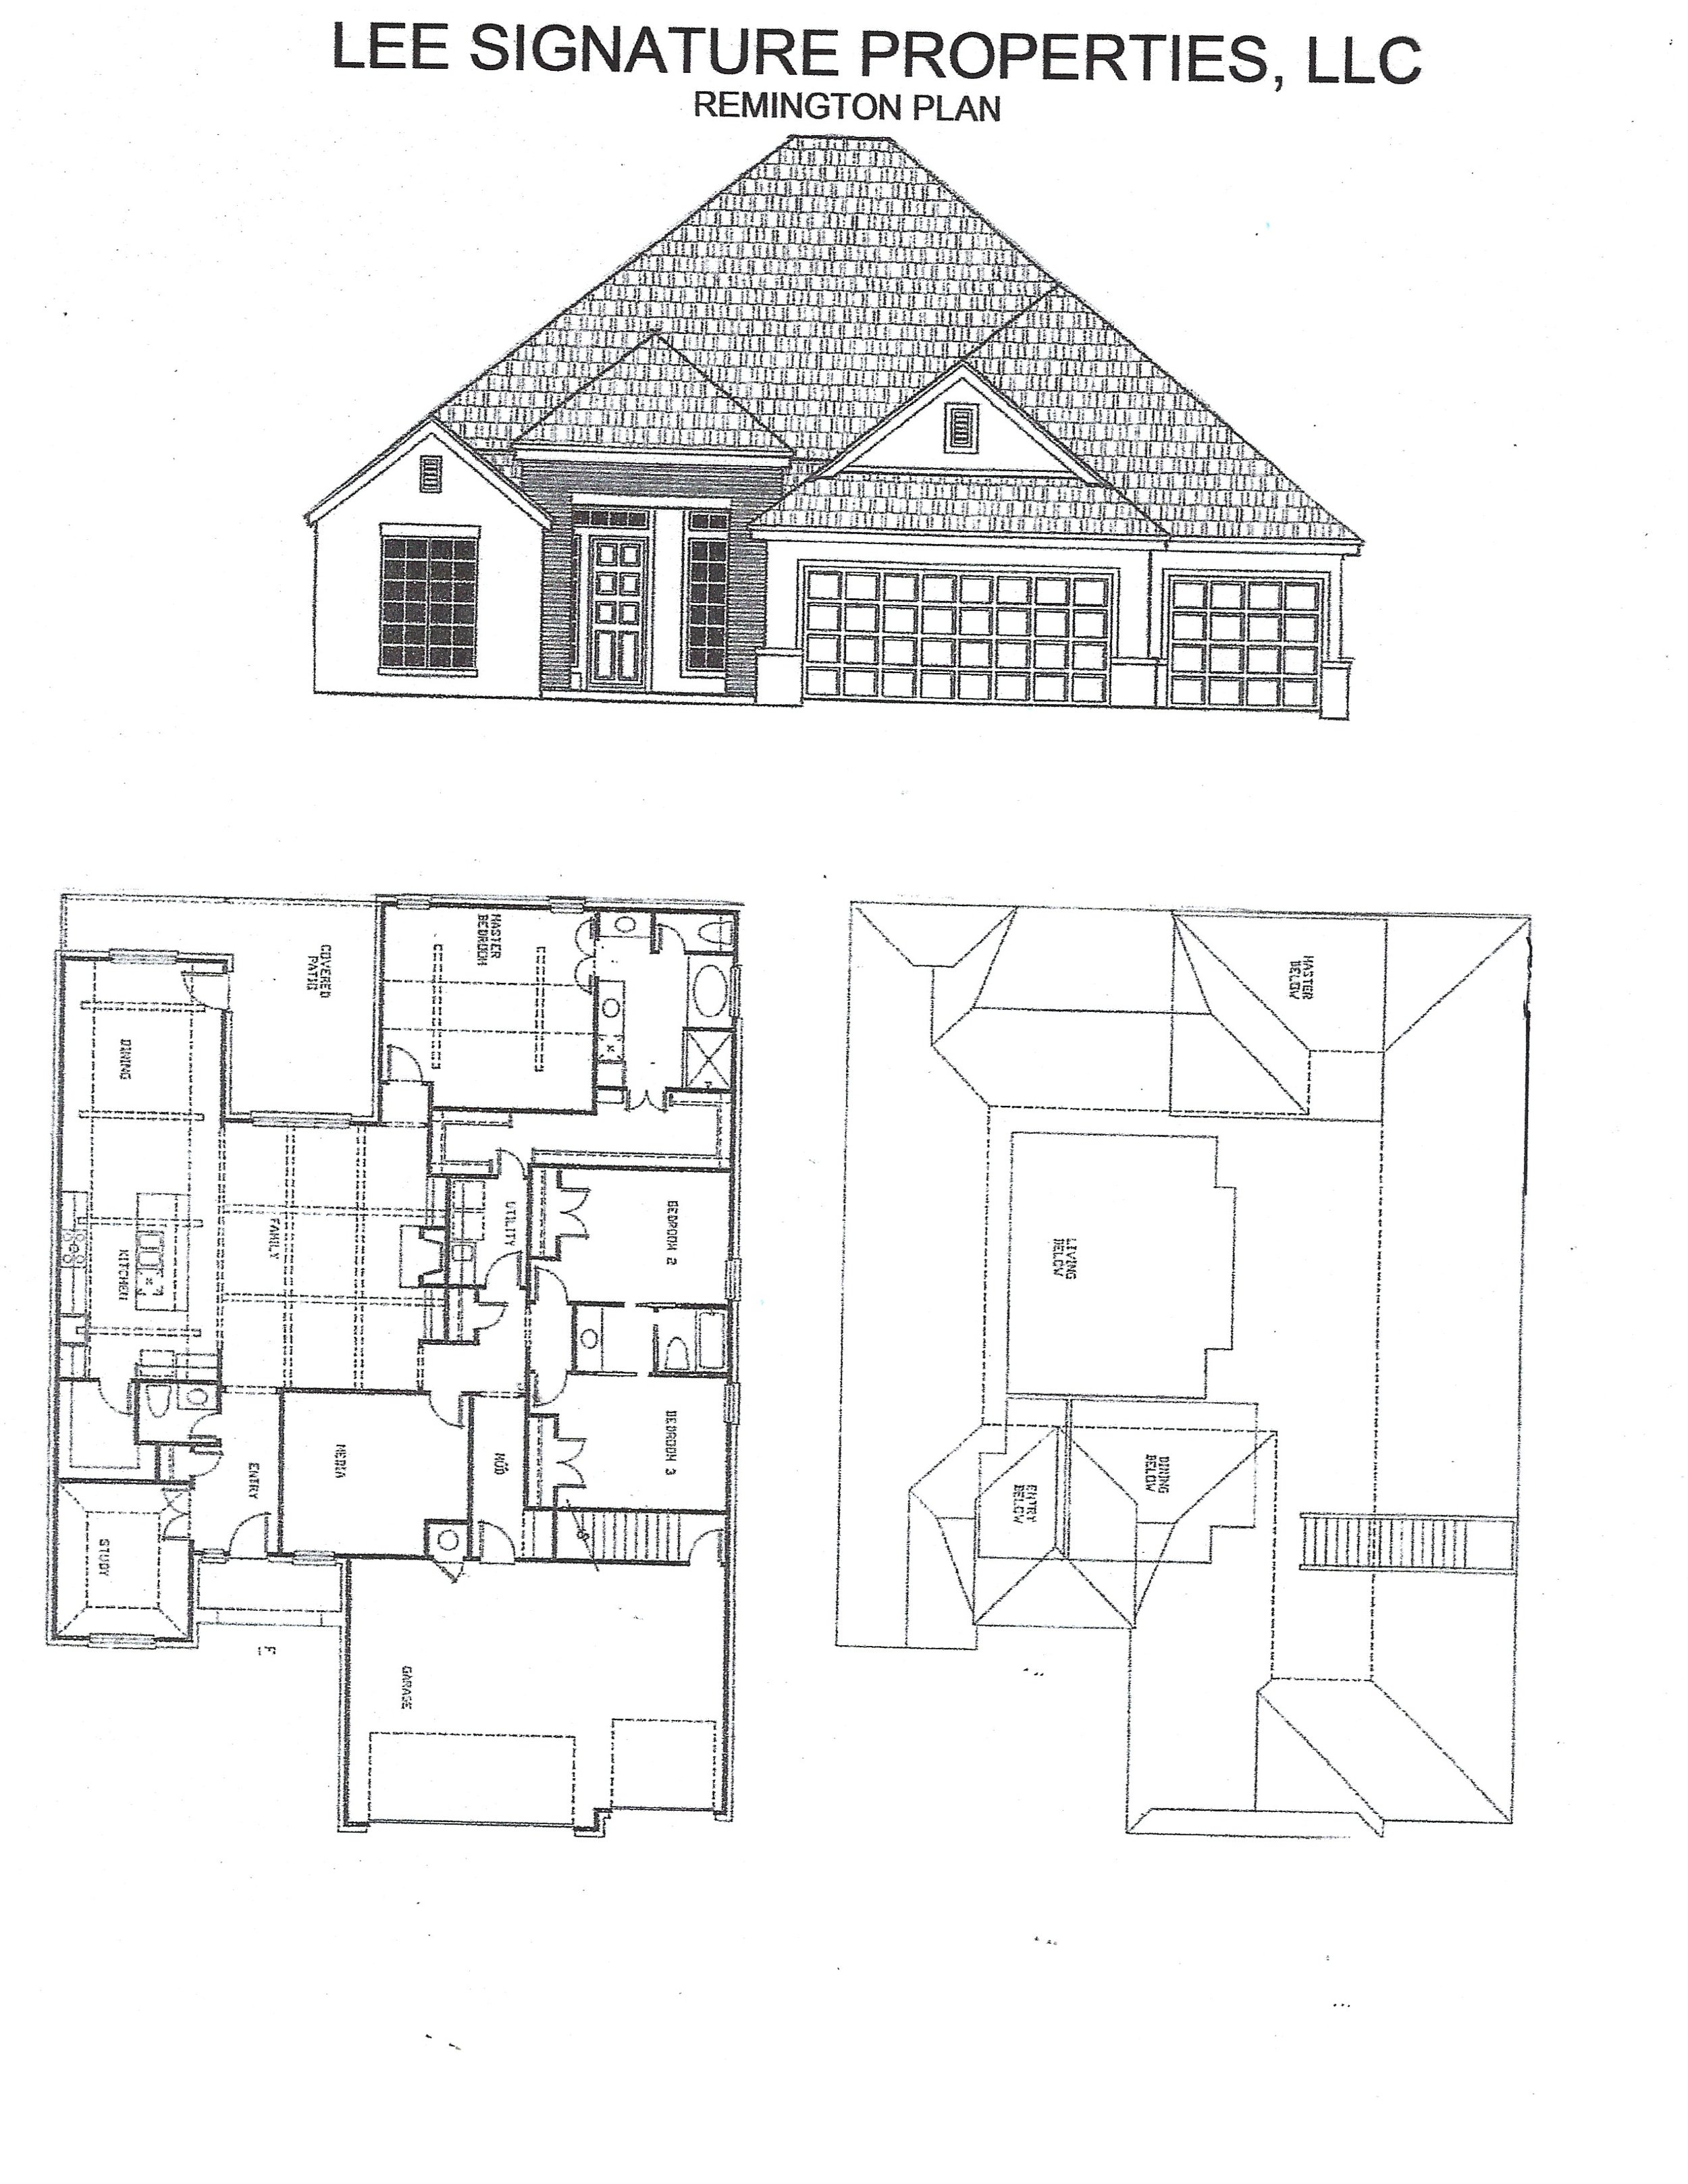 Remington Plan.jpg